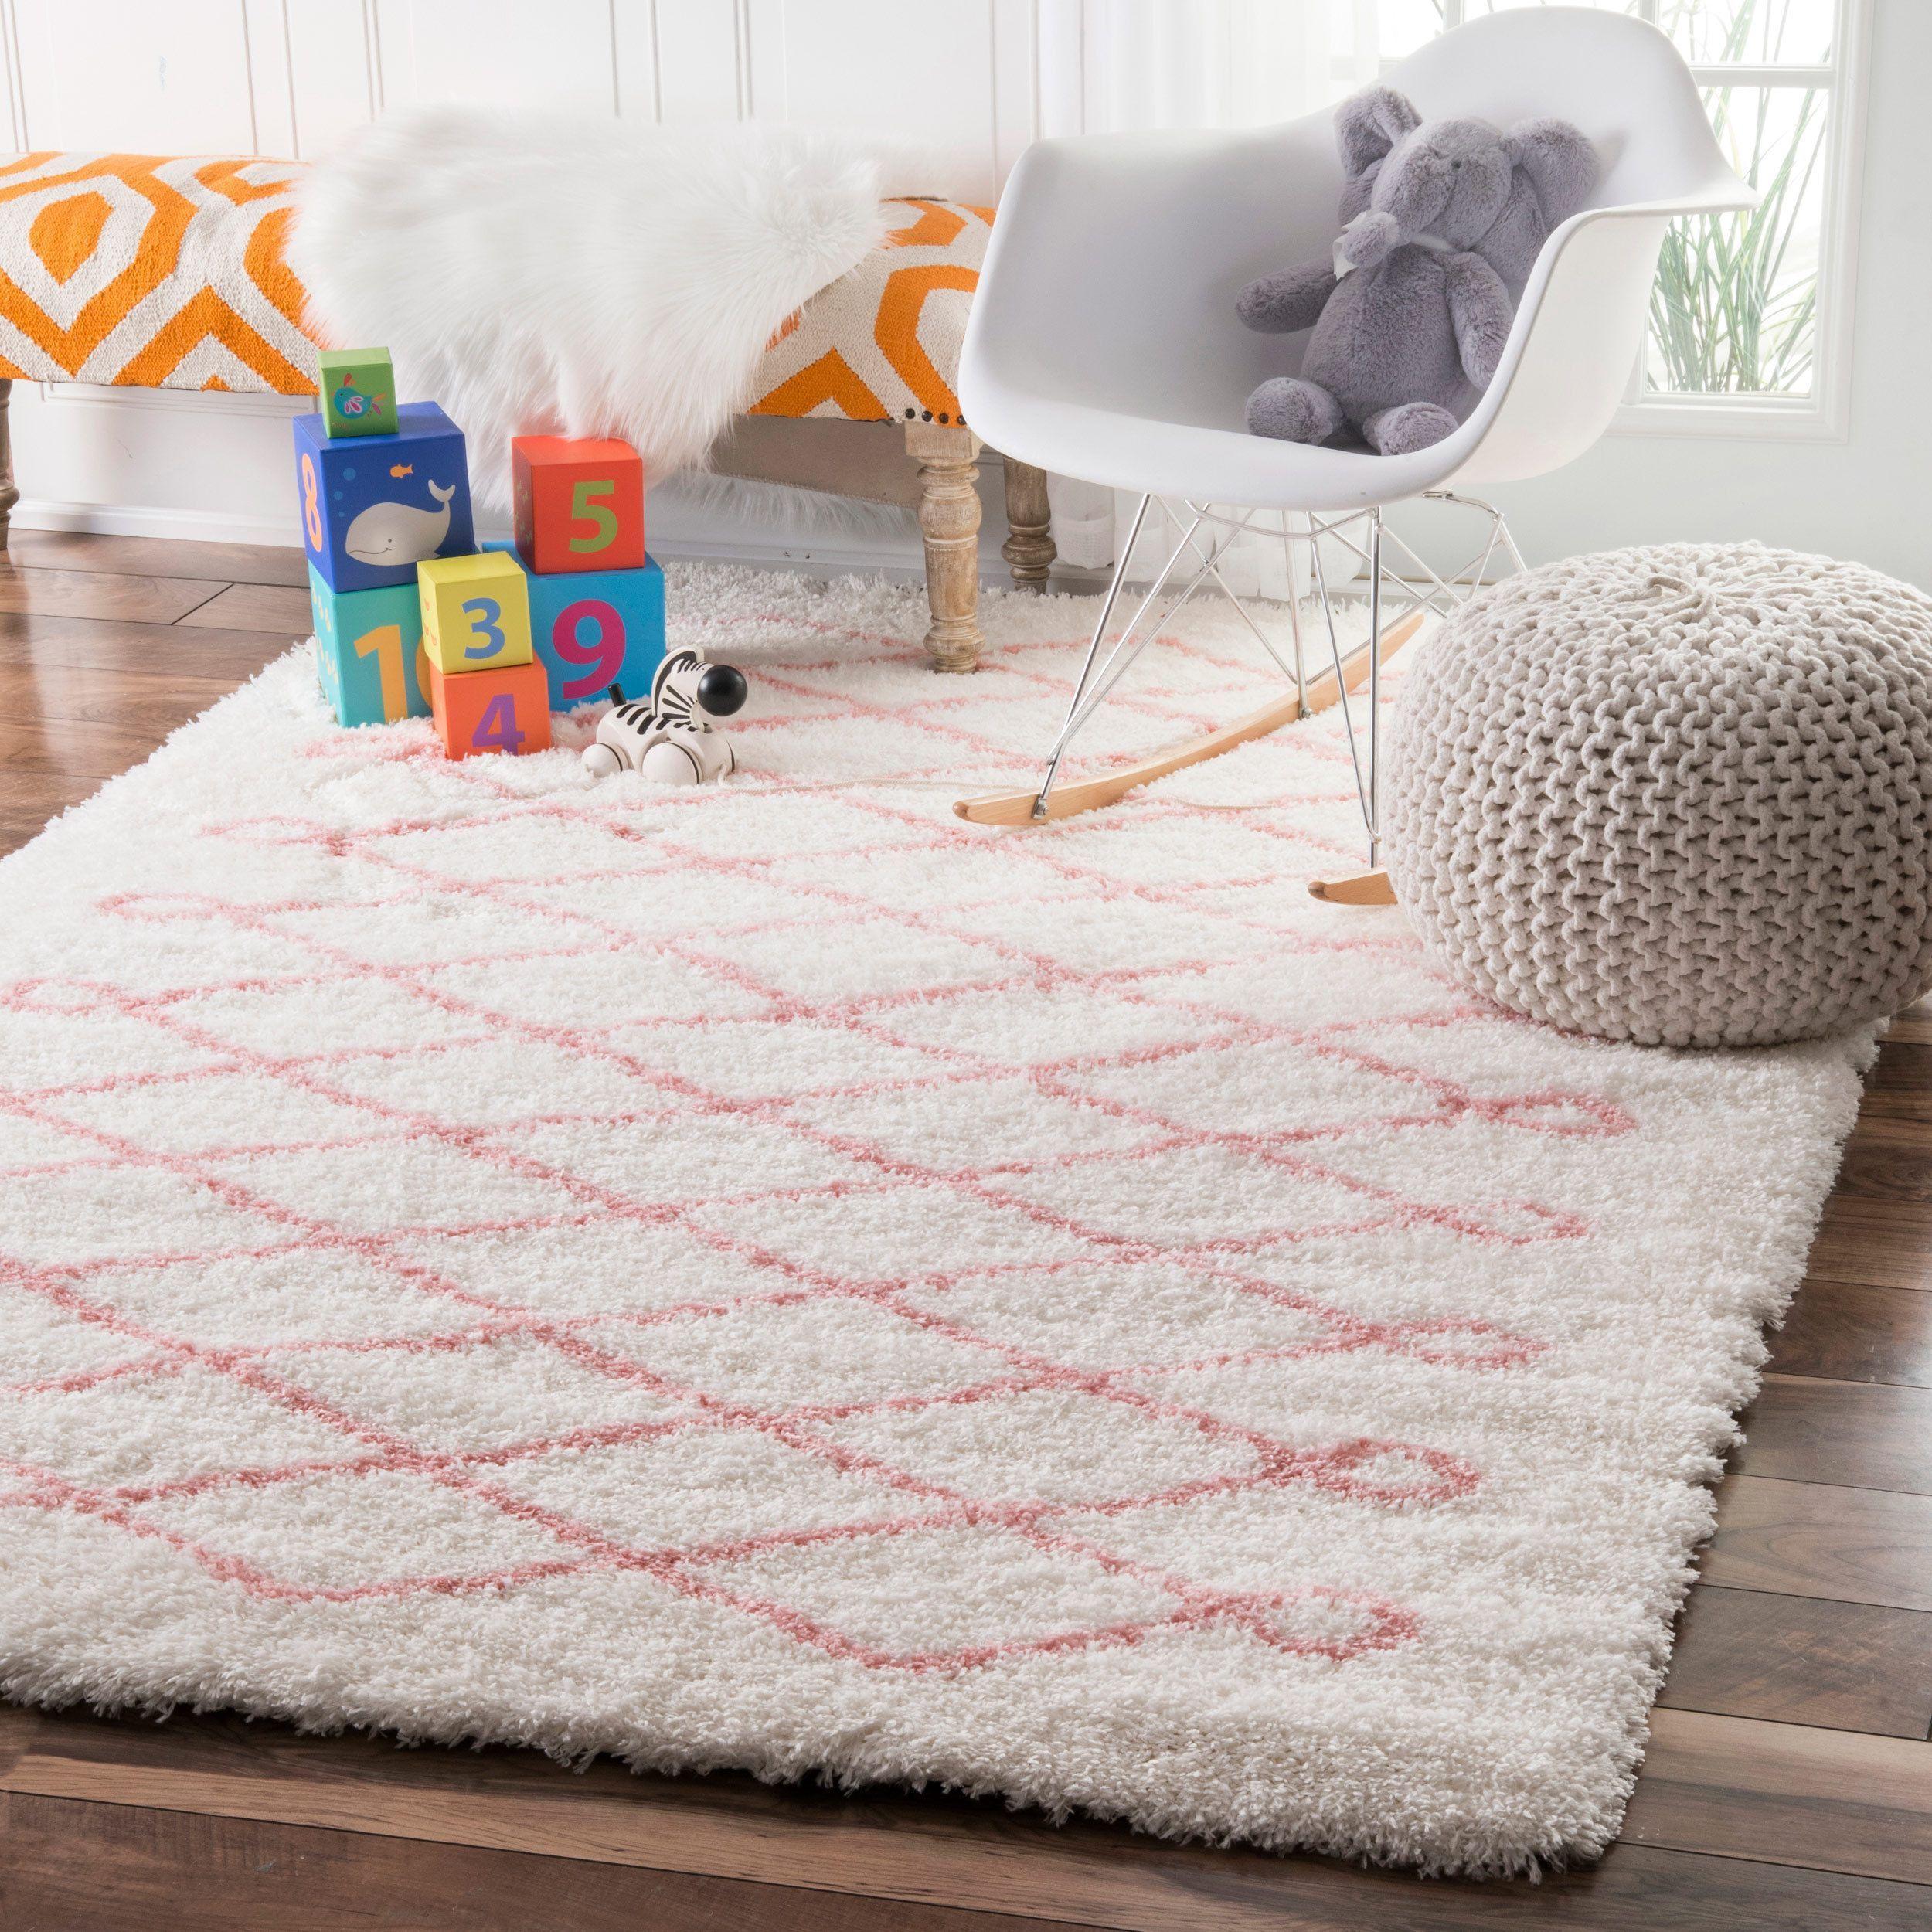 Teppich Grün Kinderzimmer Teppich Teppich Für Kinder Zimmer Kinder Auto Teppich  Kinder Schlafzimmer Teppiche Rosa Jungen